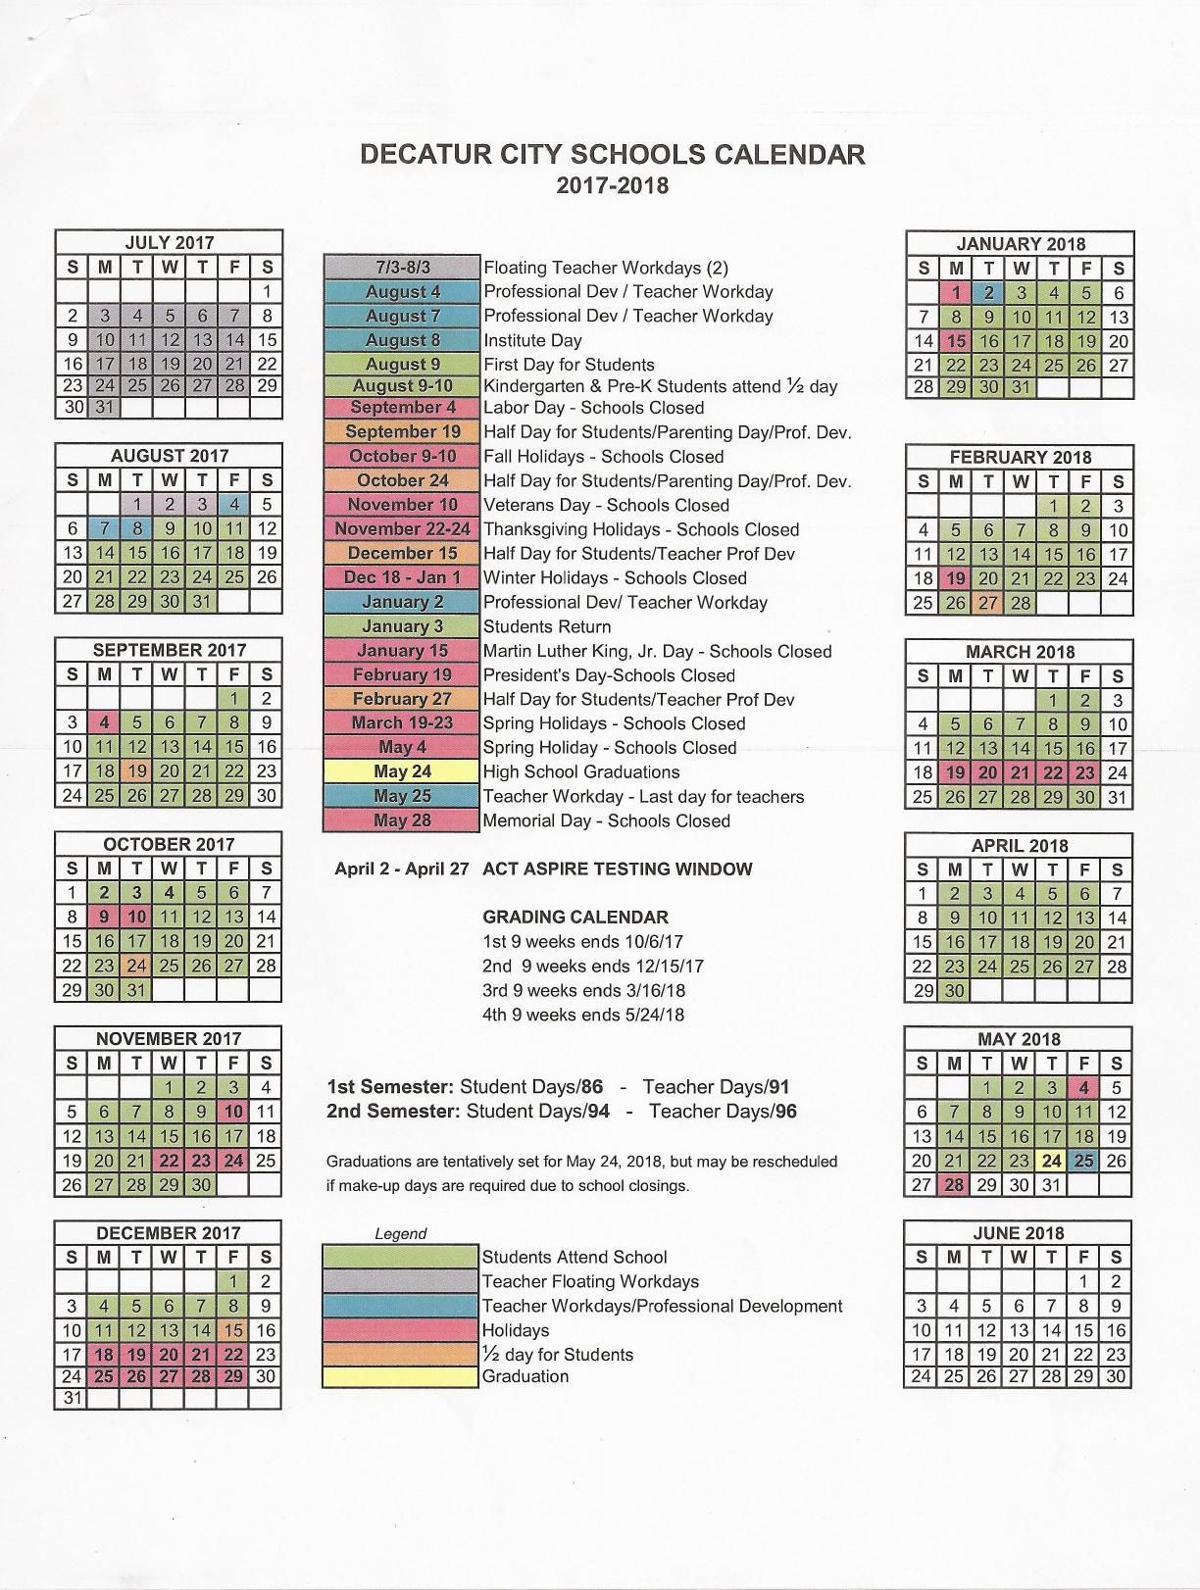 Huntsville City Schools Calendar 2019 16 DCS 2017 2018 Calendar     decaturdaily.com